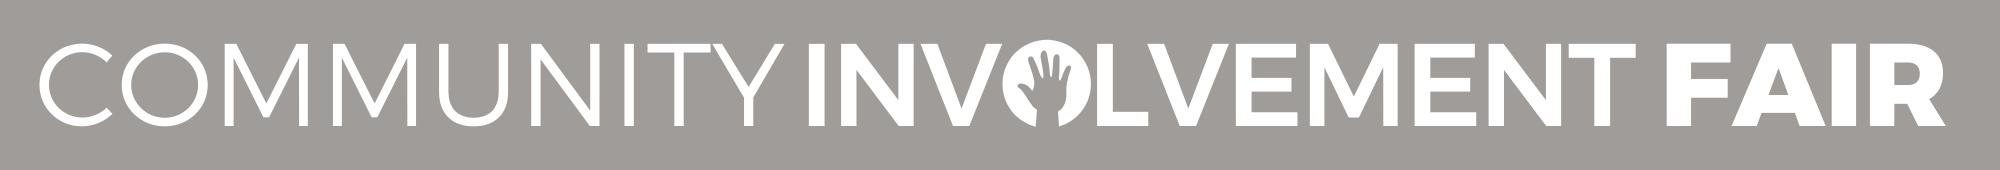 Involvement Fair Logo in gray